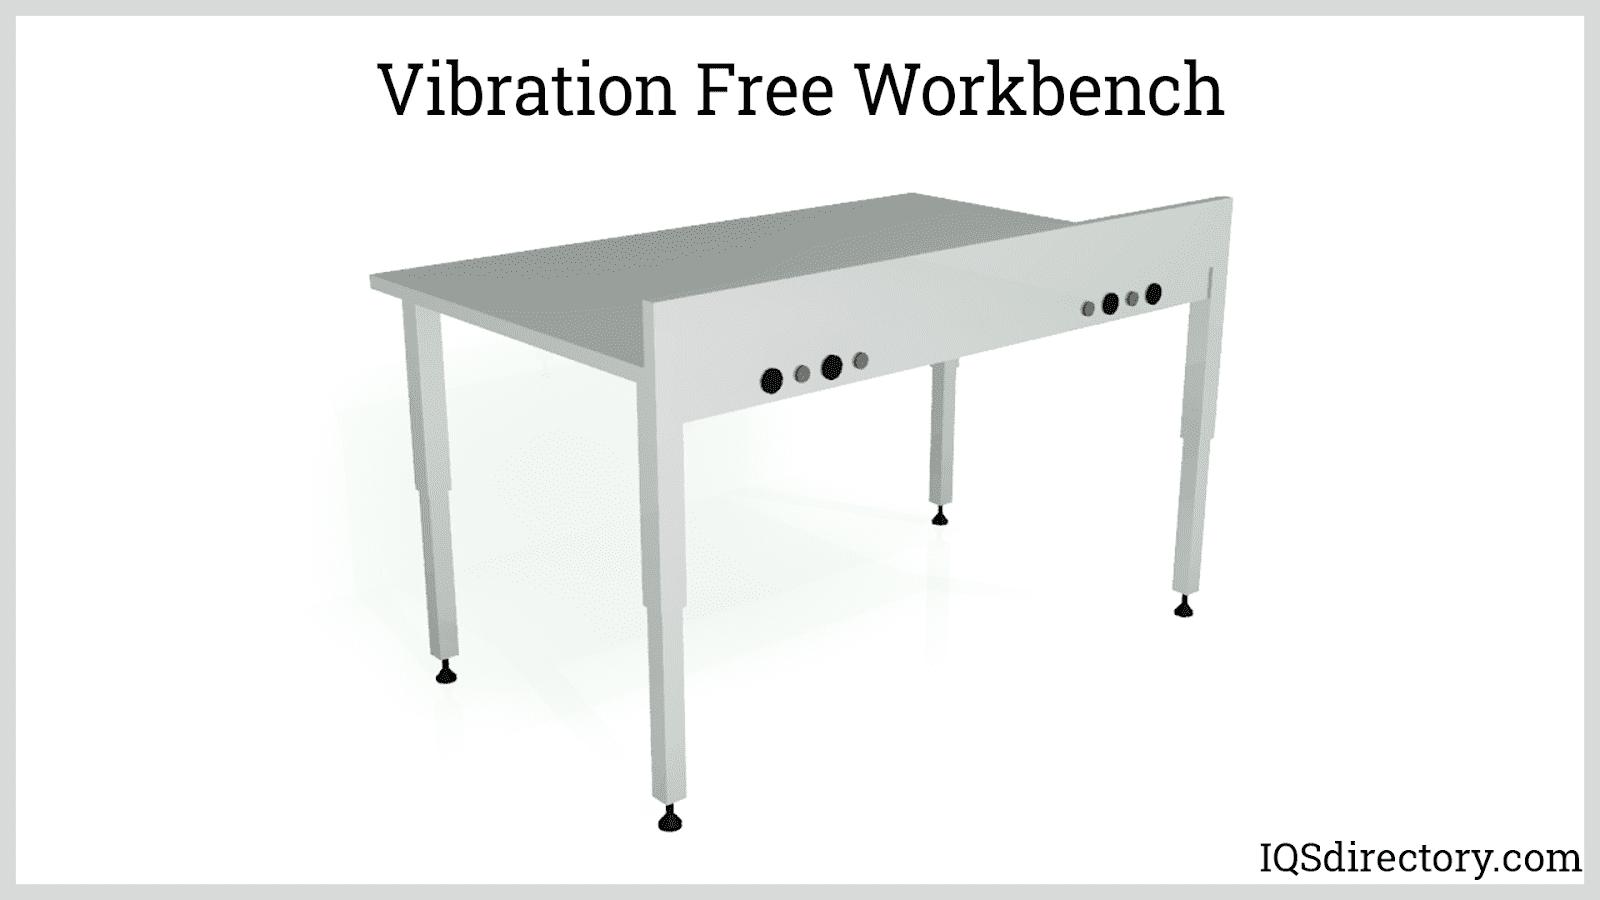 Vibration Free Workbench